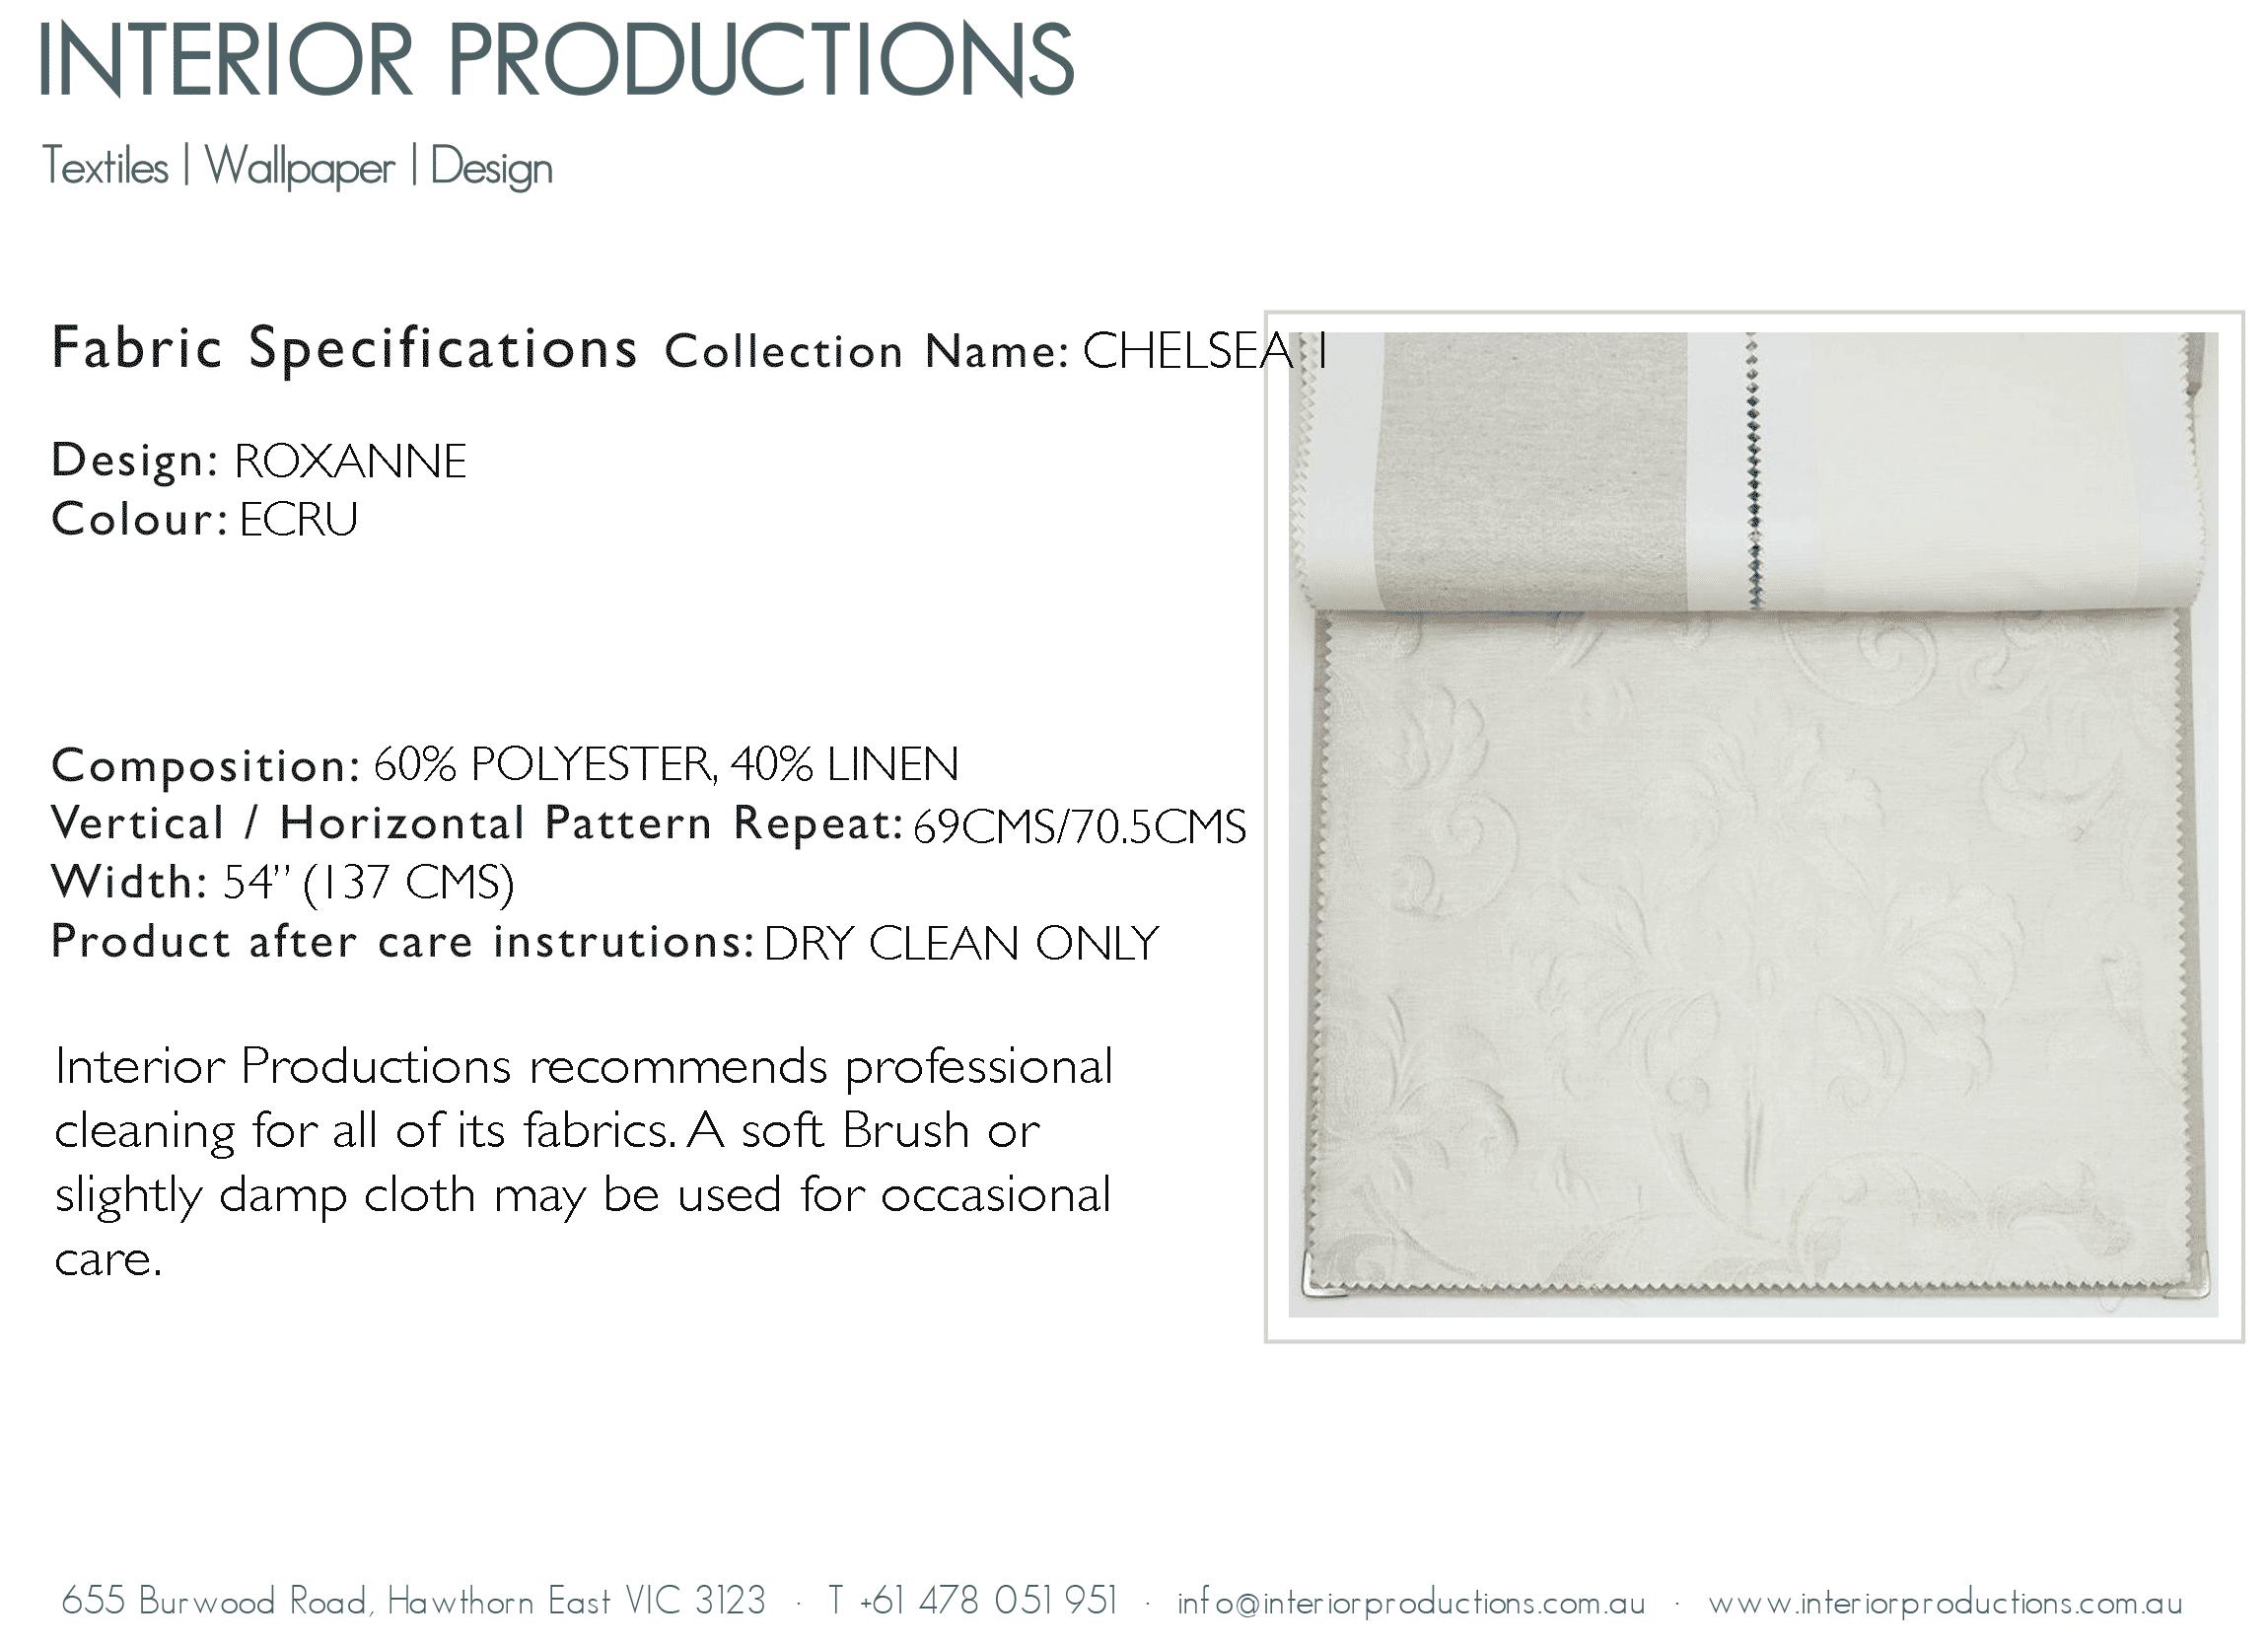 interior_productions_ROXANNE---ECRU